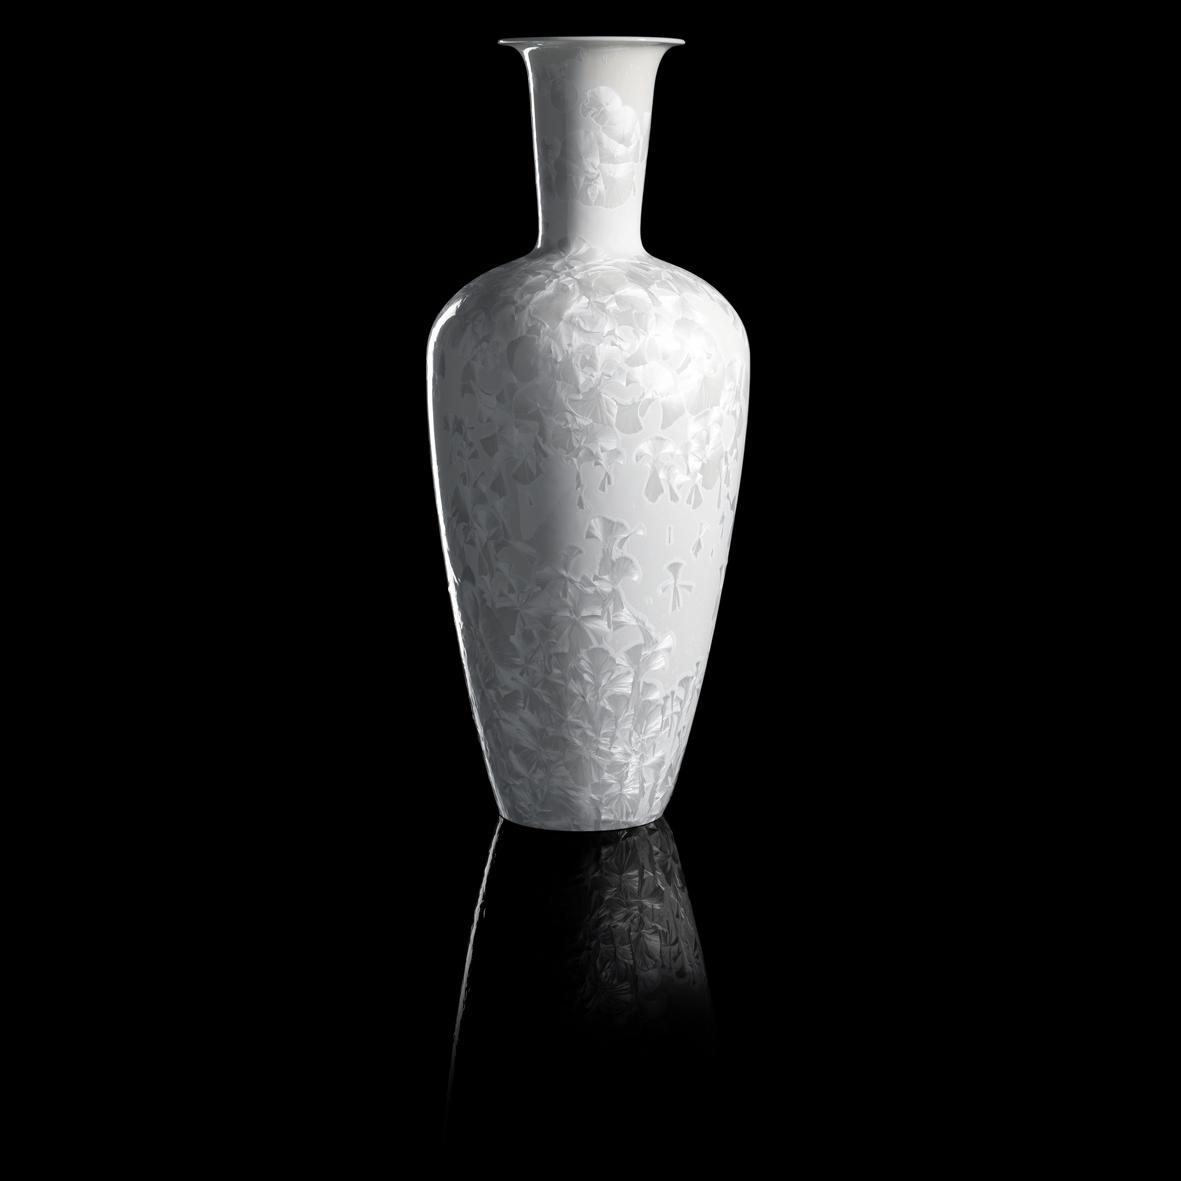 Vase Solitaire Edition Kollhoff